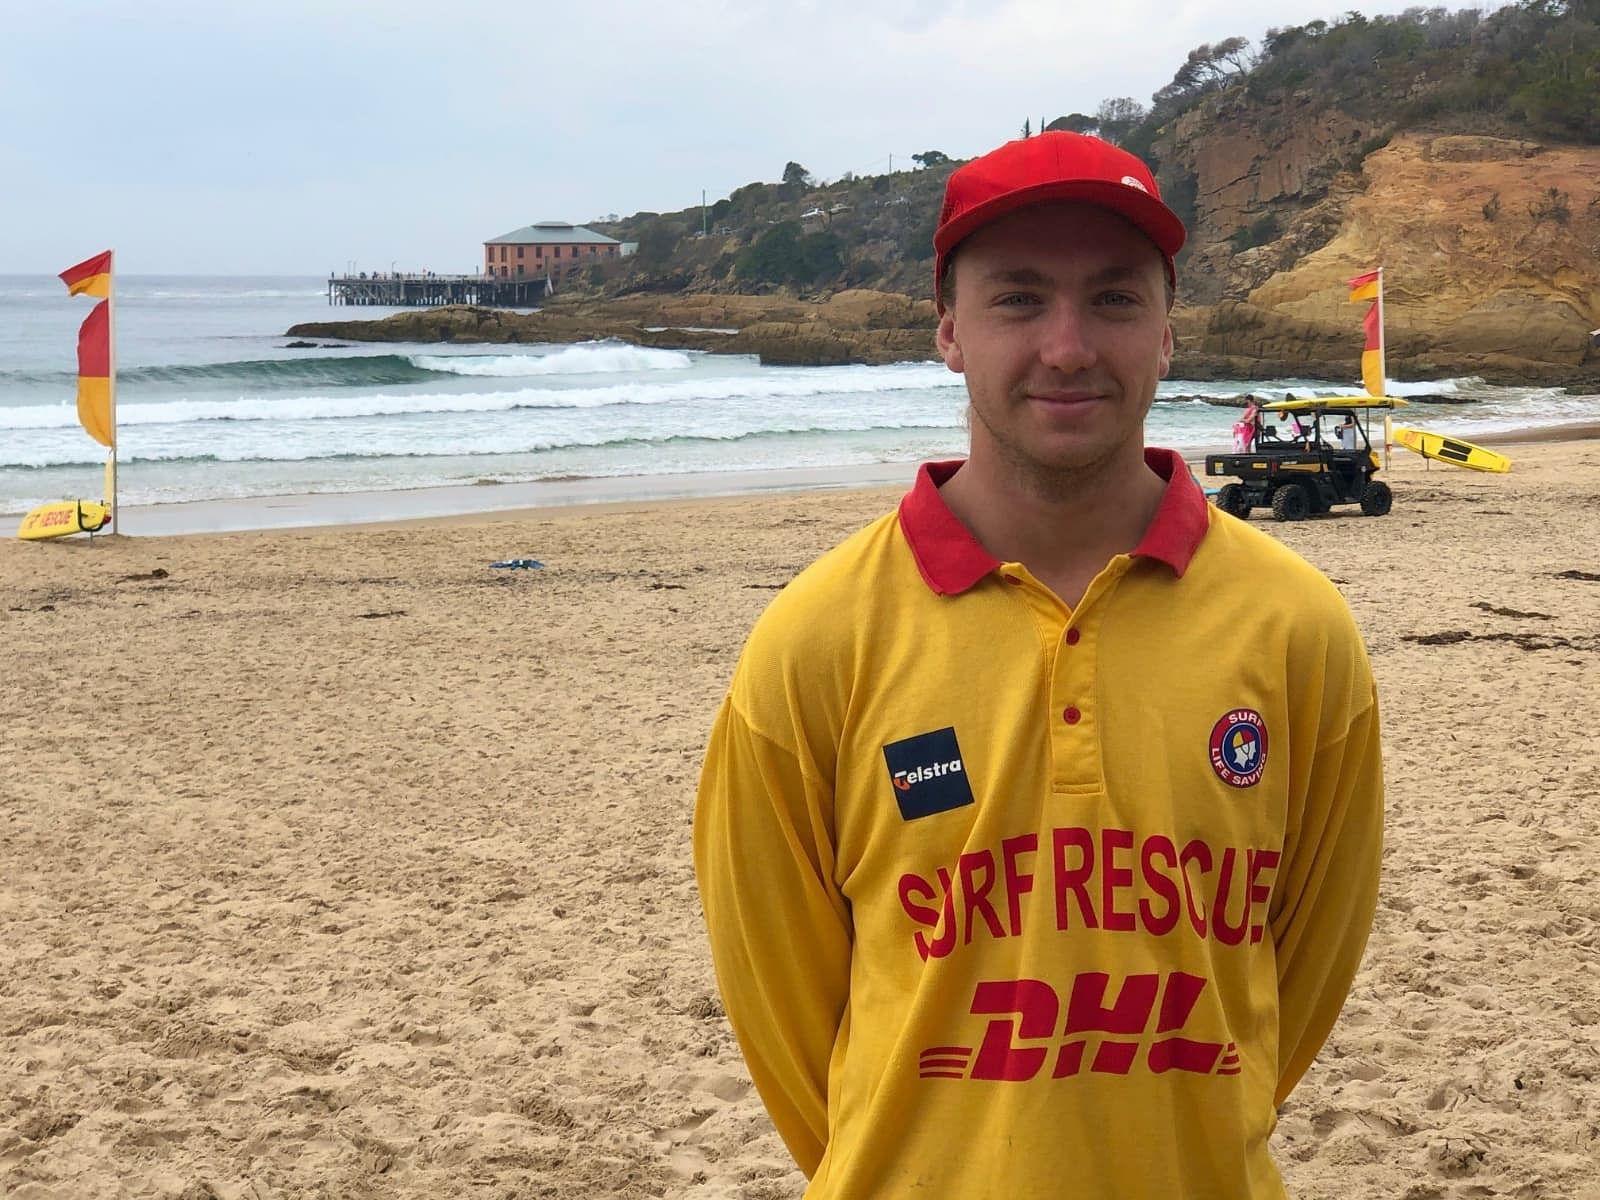 Cooper Avis, Captain of Gerringong Surf Club on patrol at Tathra during his families recent 'Empty Esky' getaway.